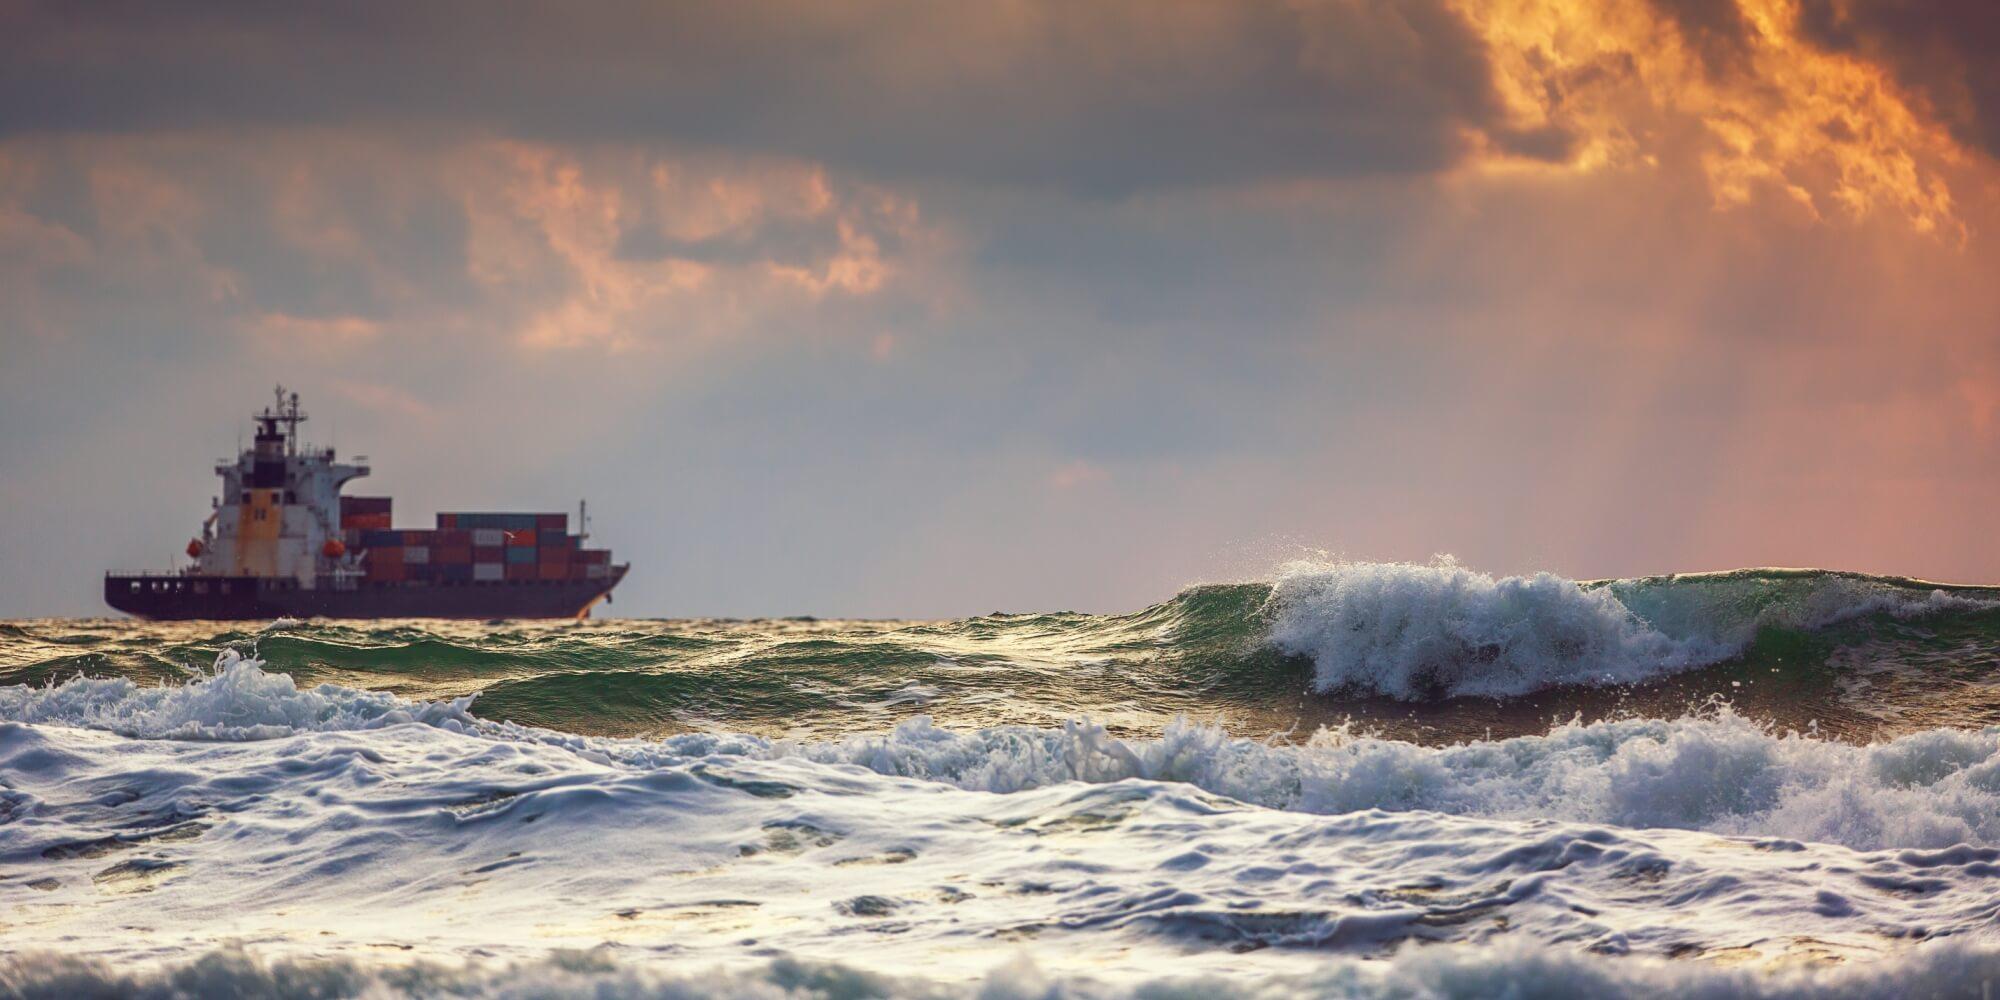 Seafarers Charity - Merchant Ship At Sea